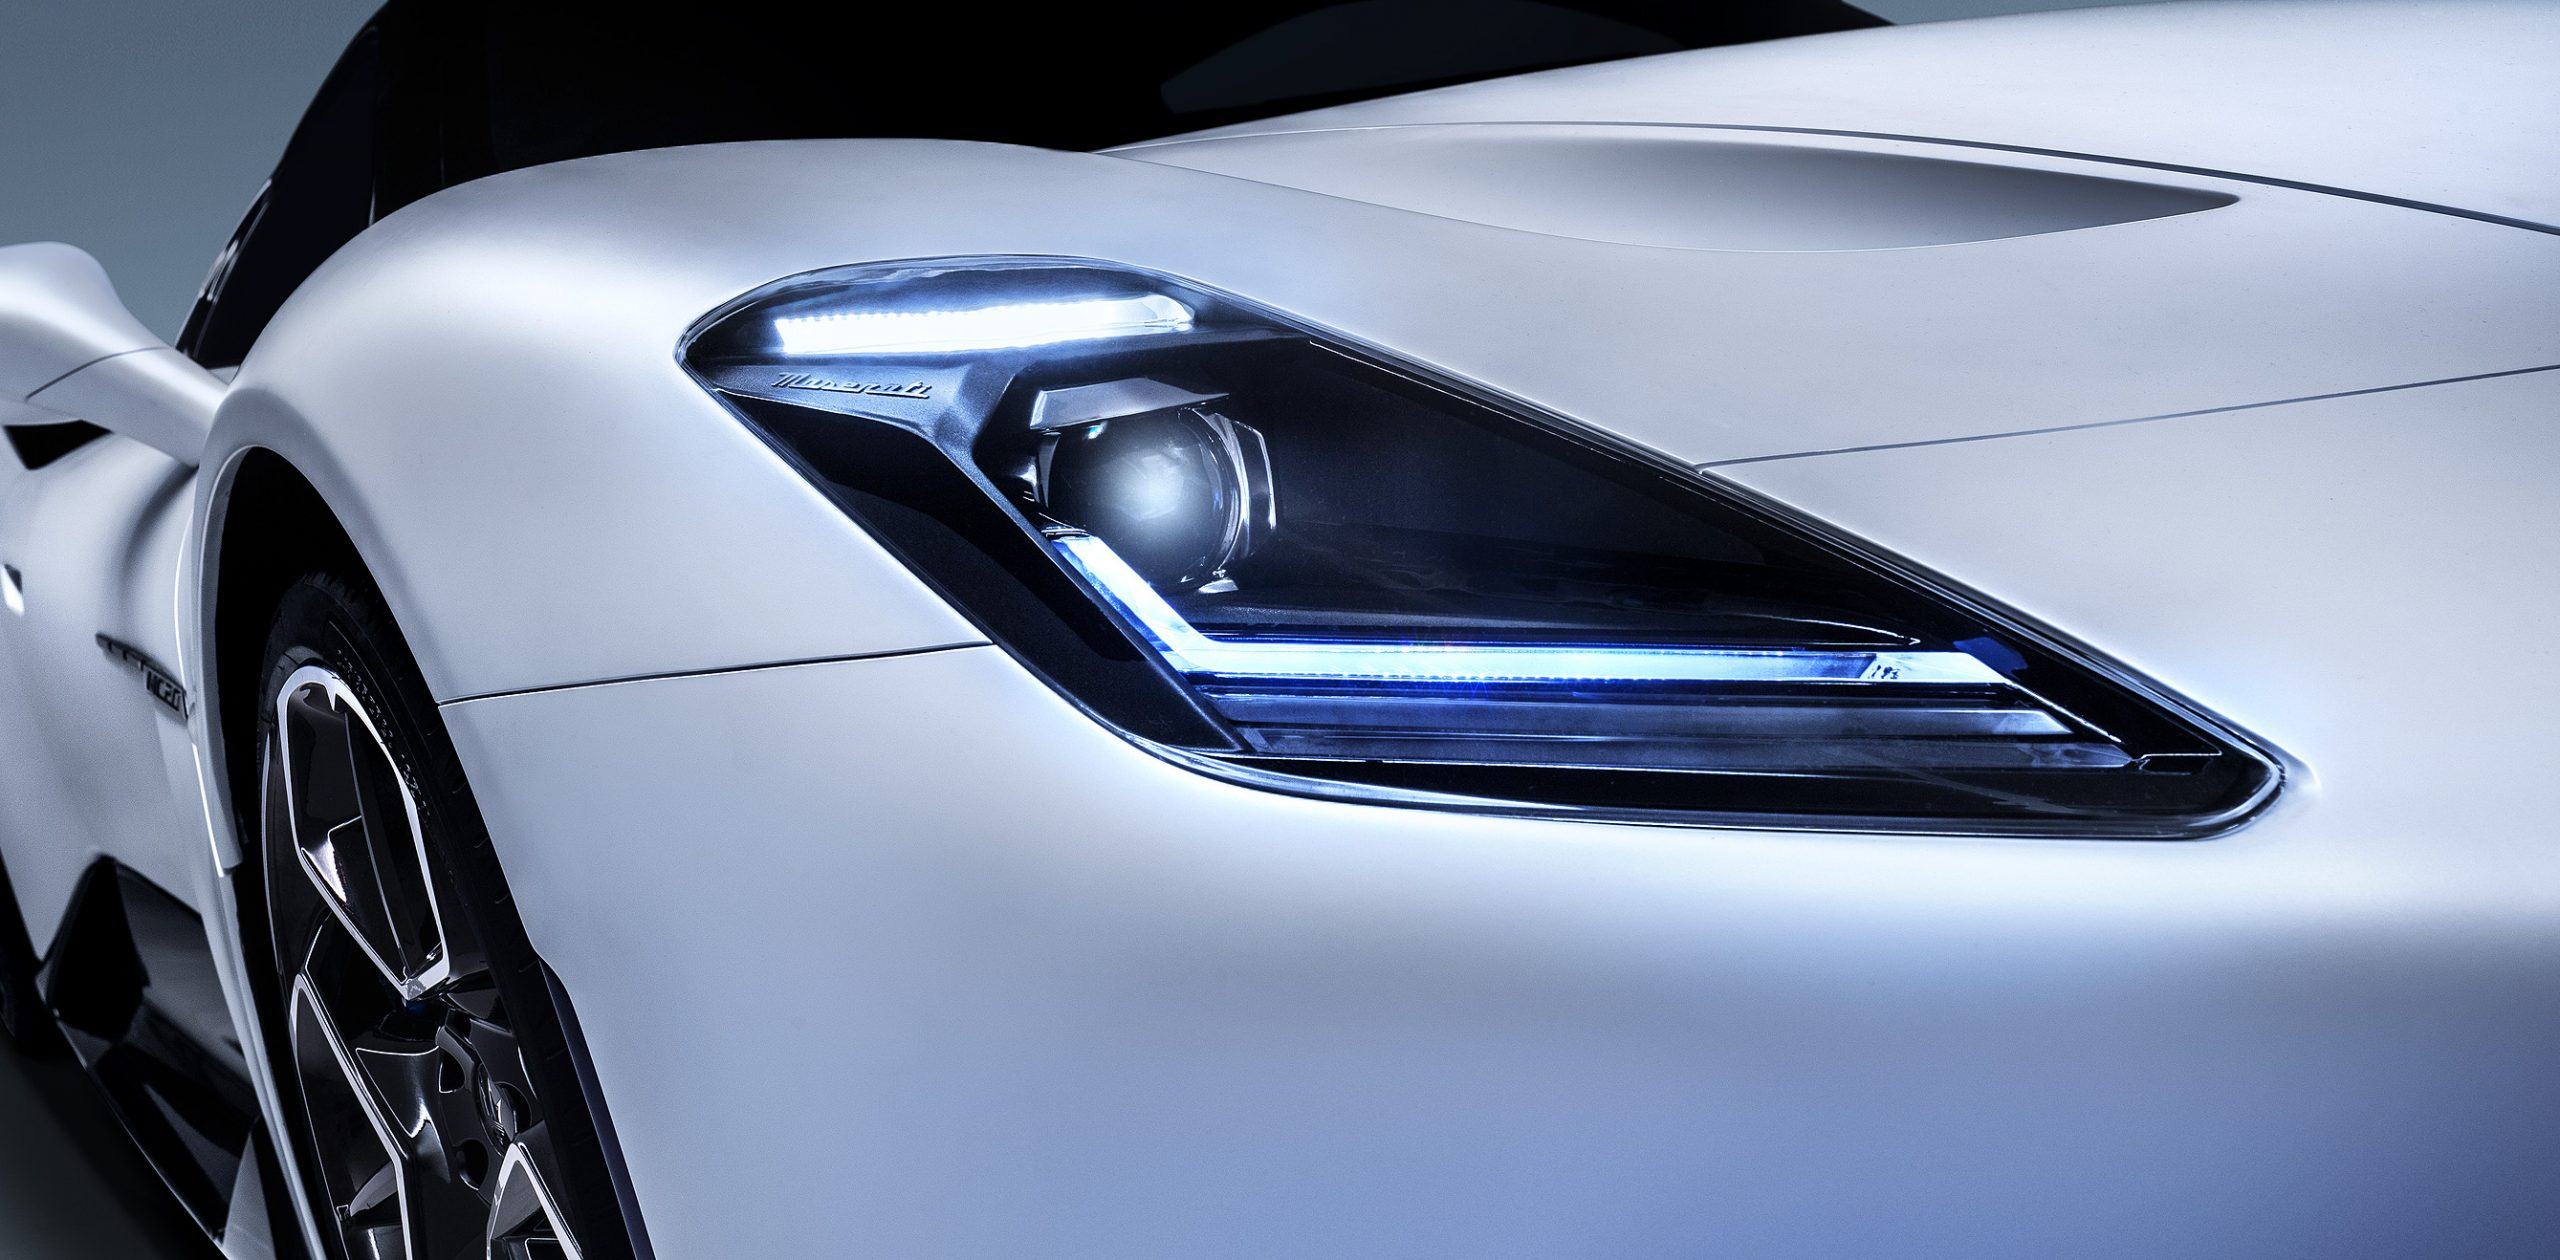 Maserati MC20 headlight